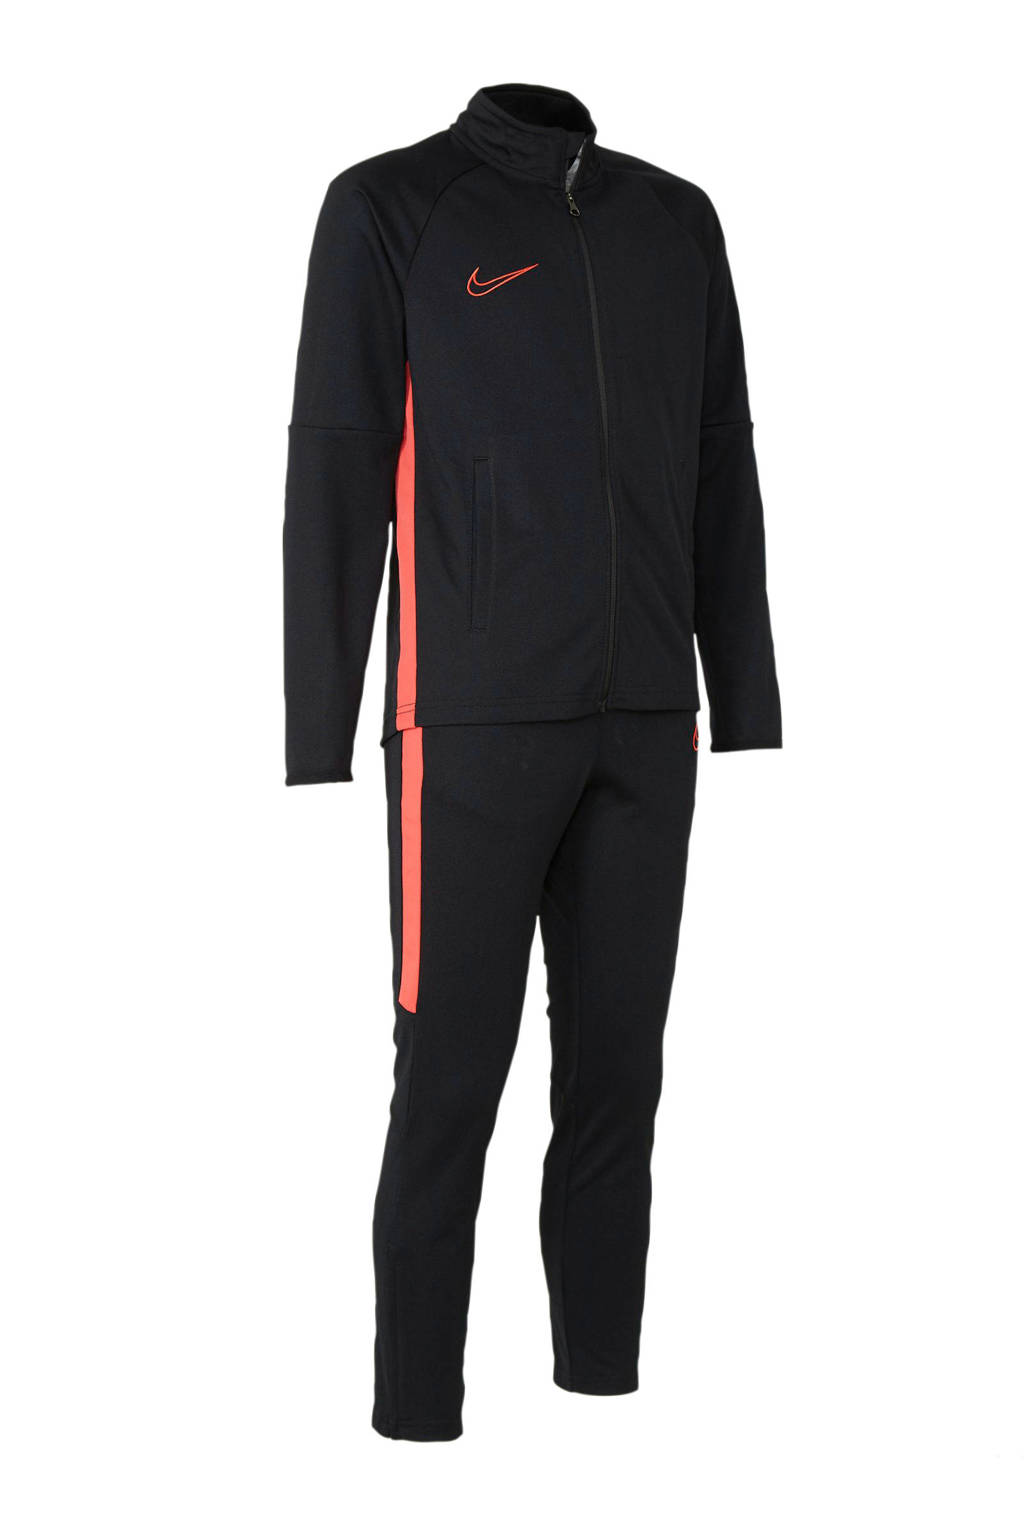 Nike Junior  trainingspak zwart, Zwart/rood